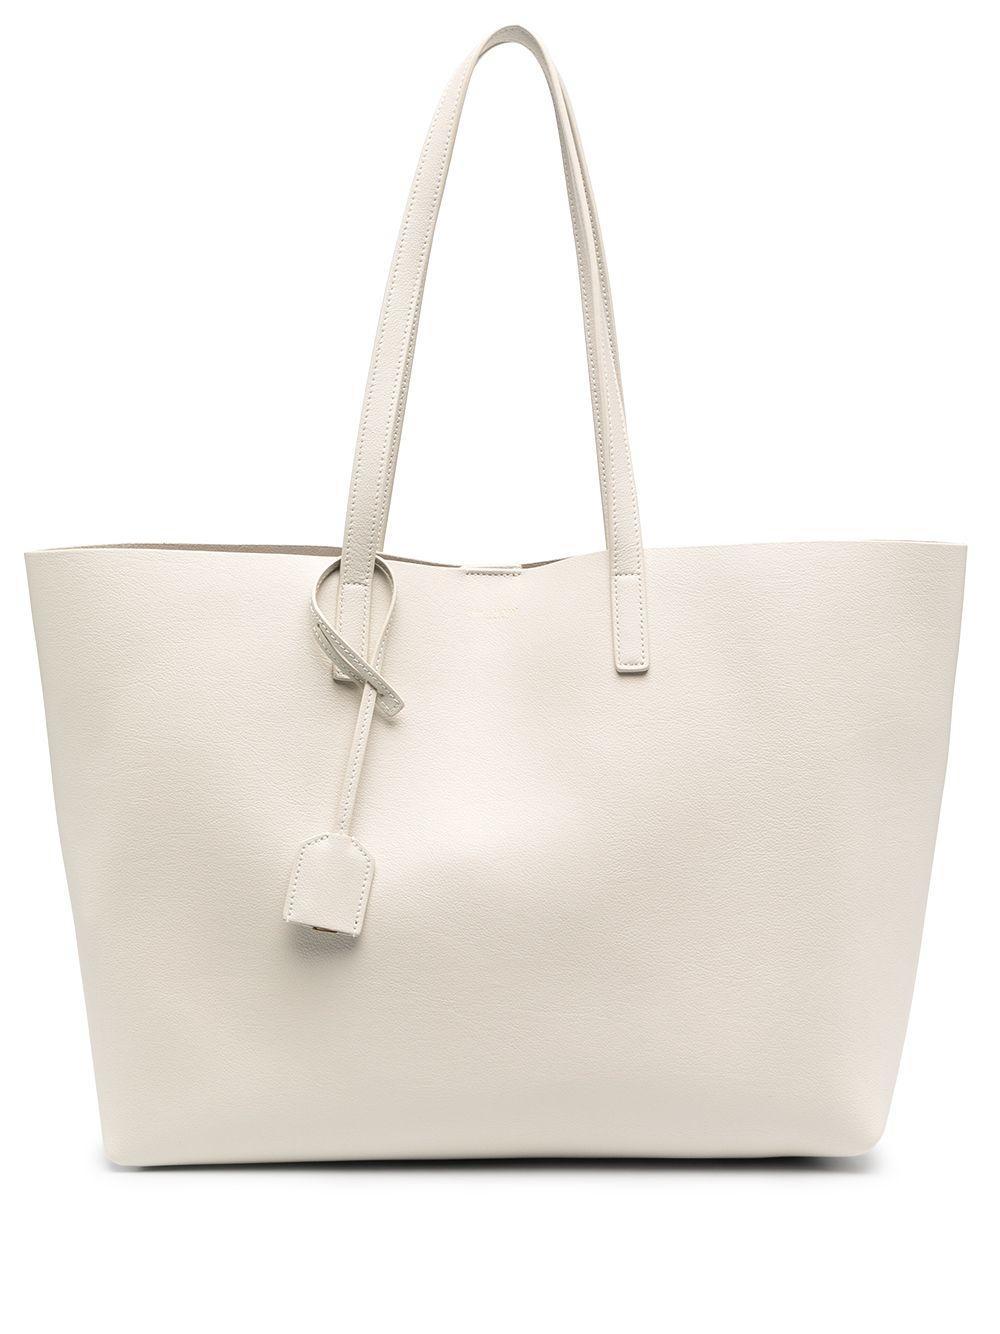 Shopping Bag Tote